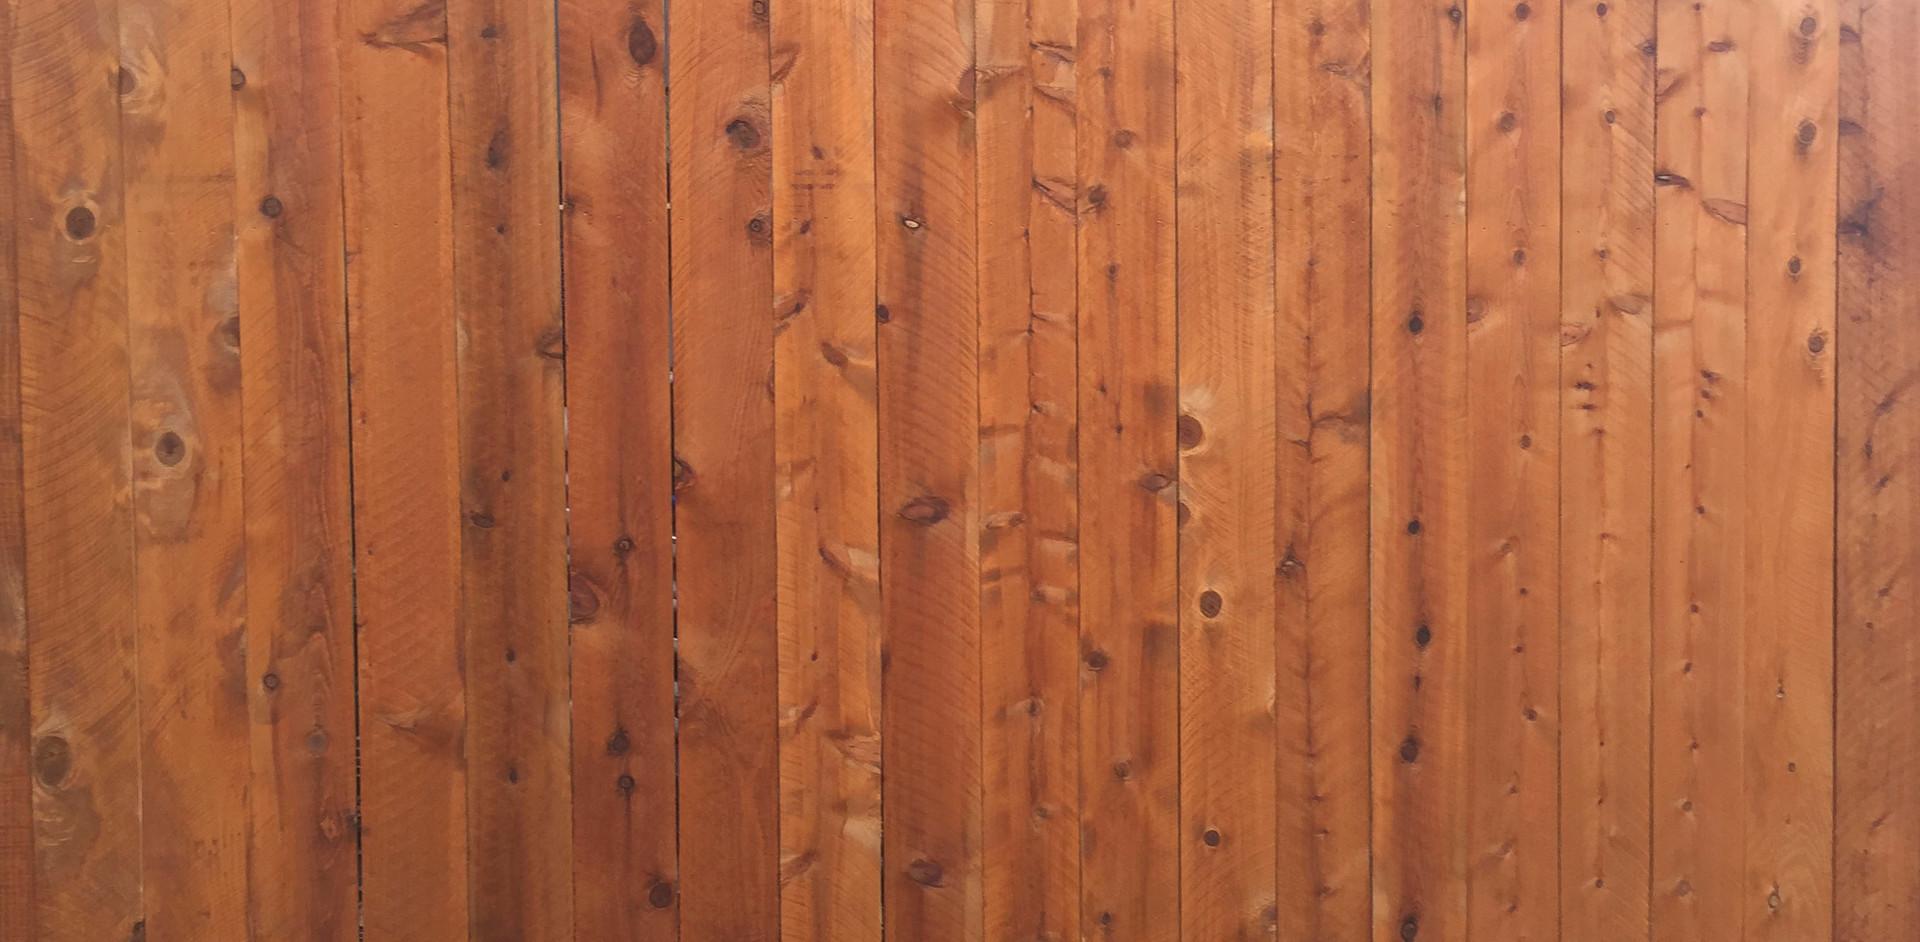 Dog Ear Cedar